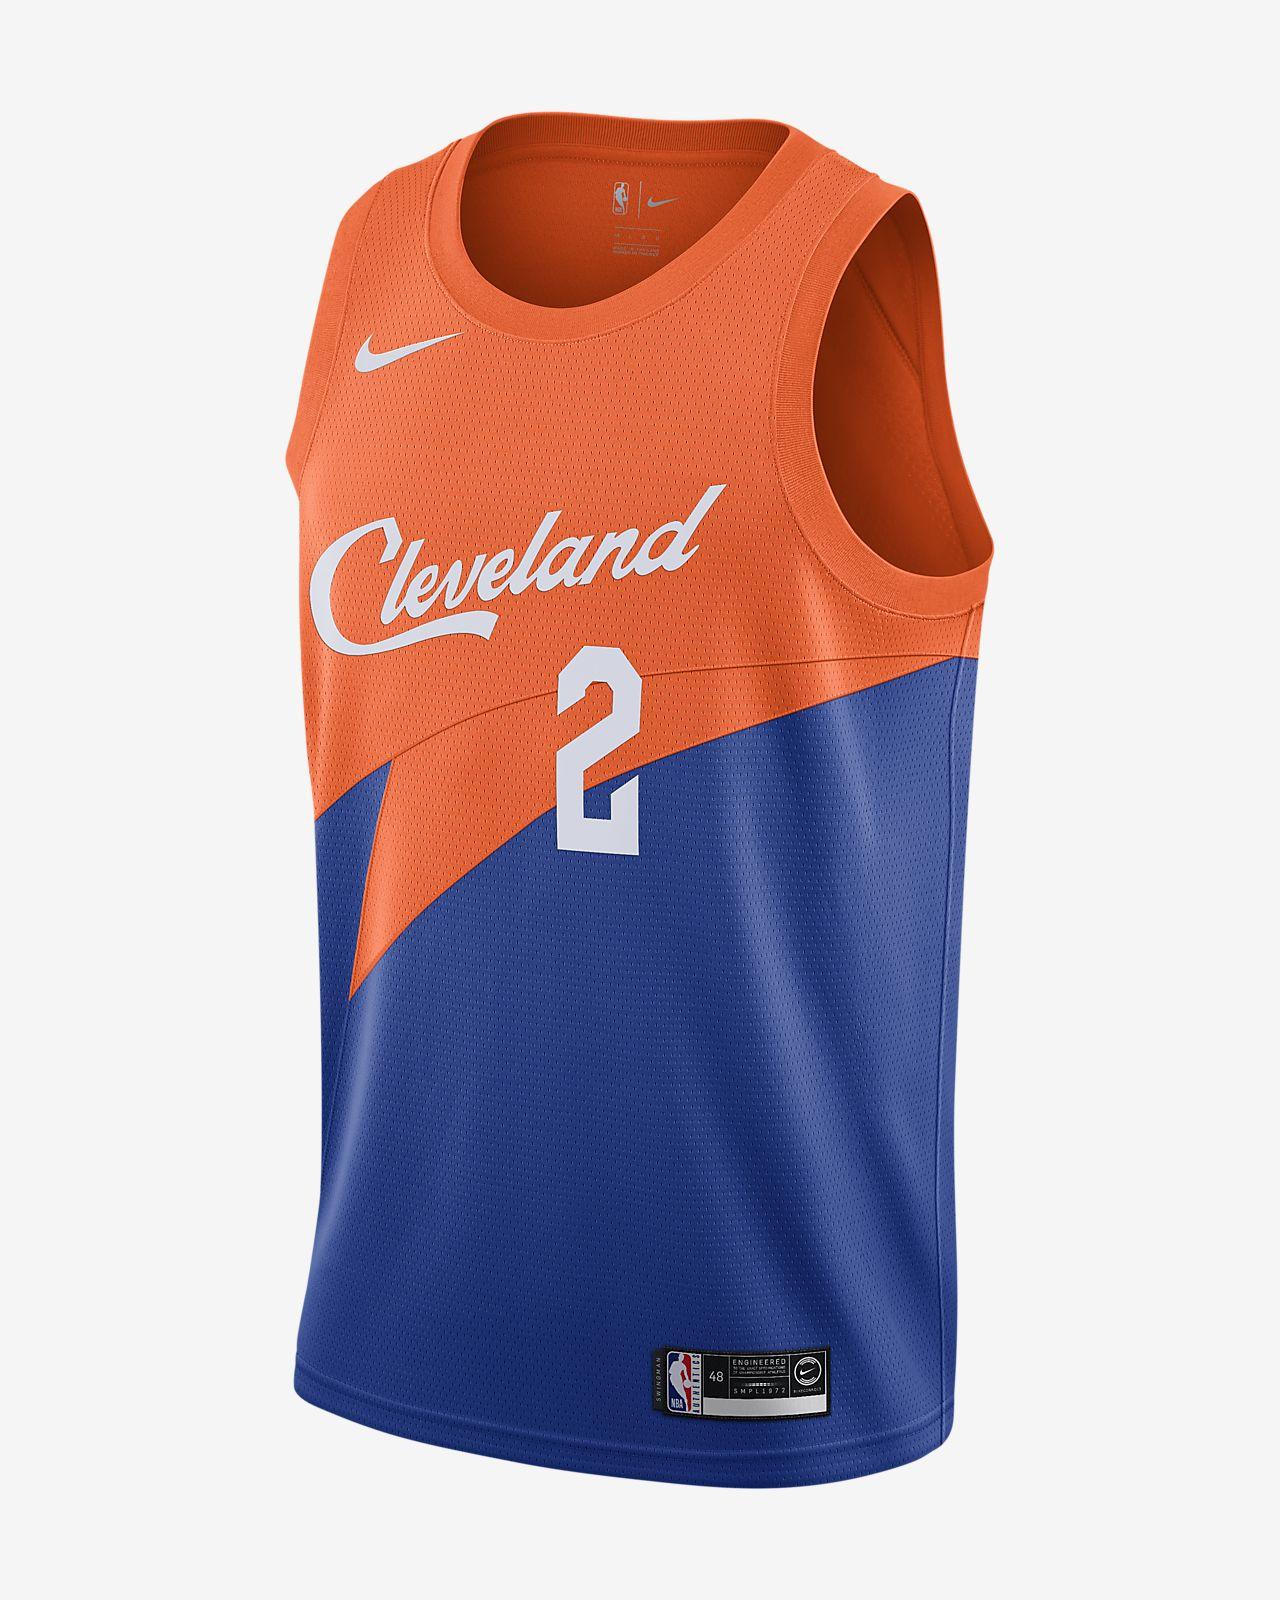 Męska koszulka Nike NBA Connected Jersey Collin Sexton City Edition Swingman (Cleveland Cavaliers)